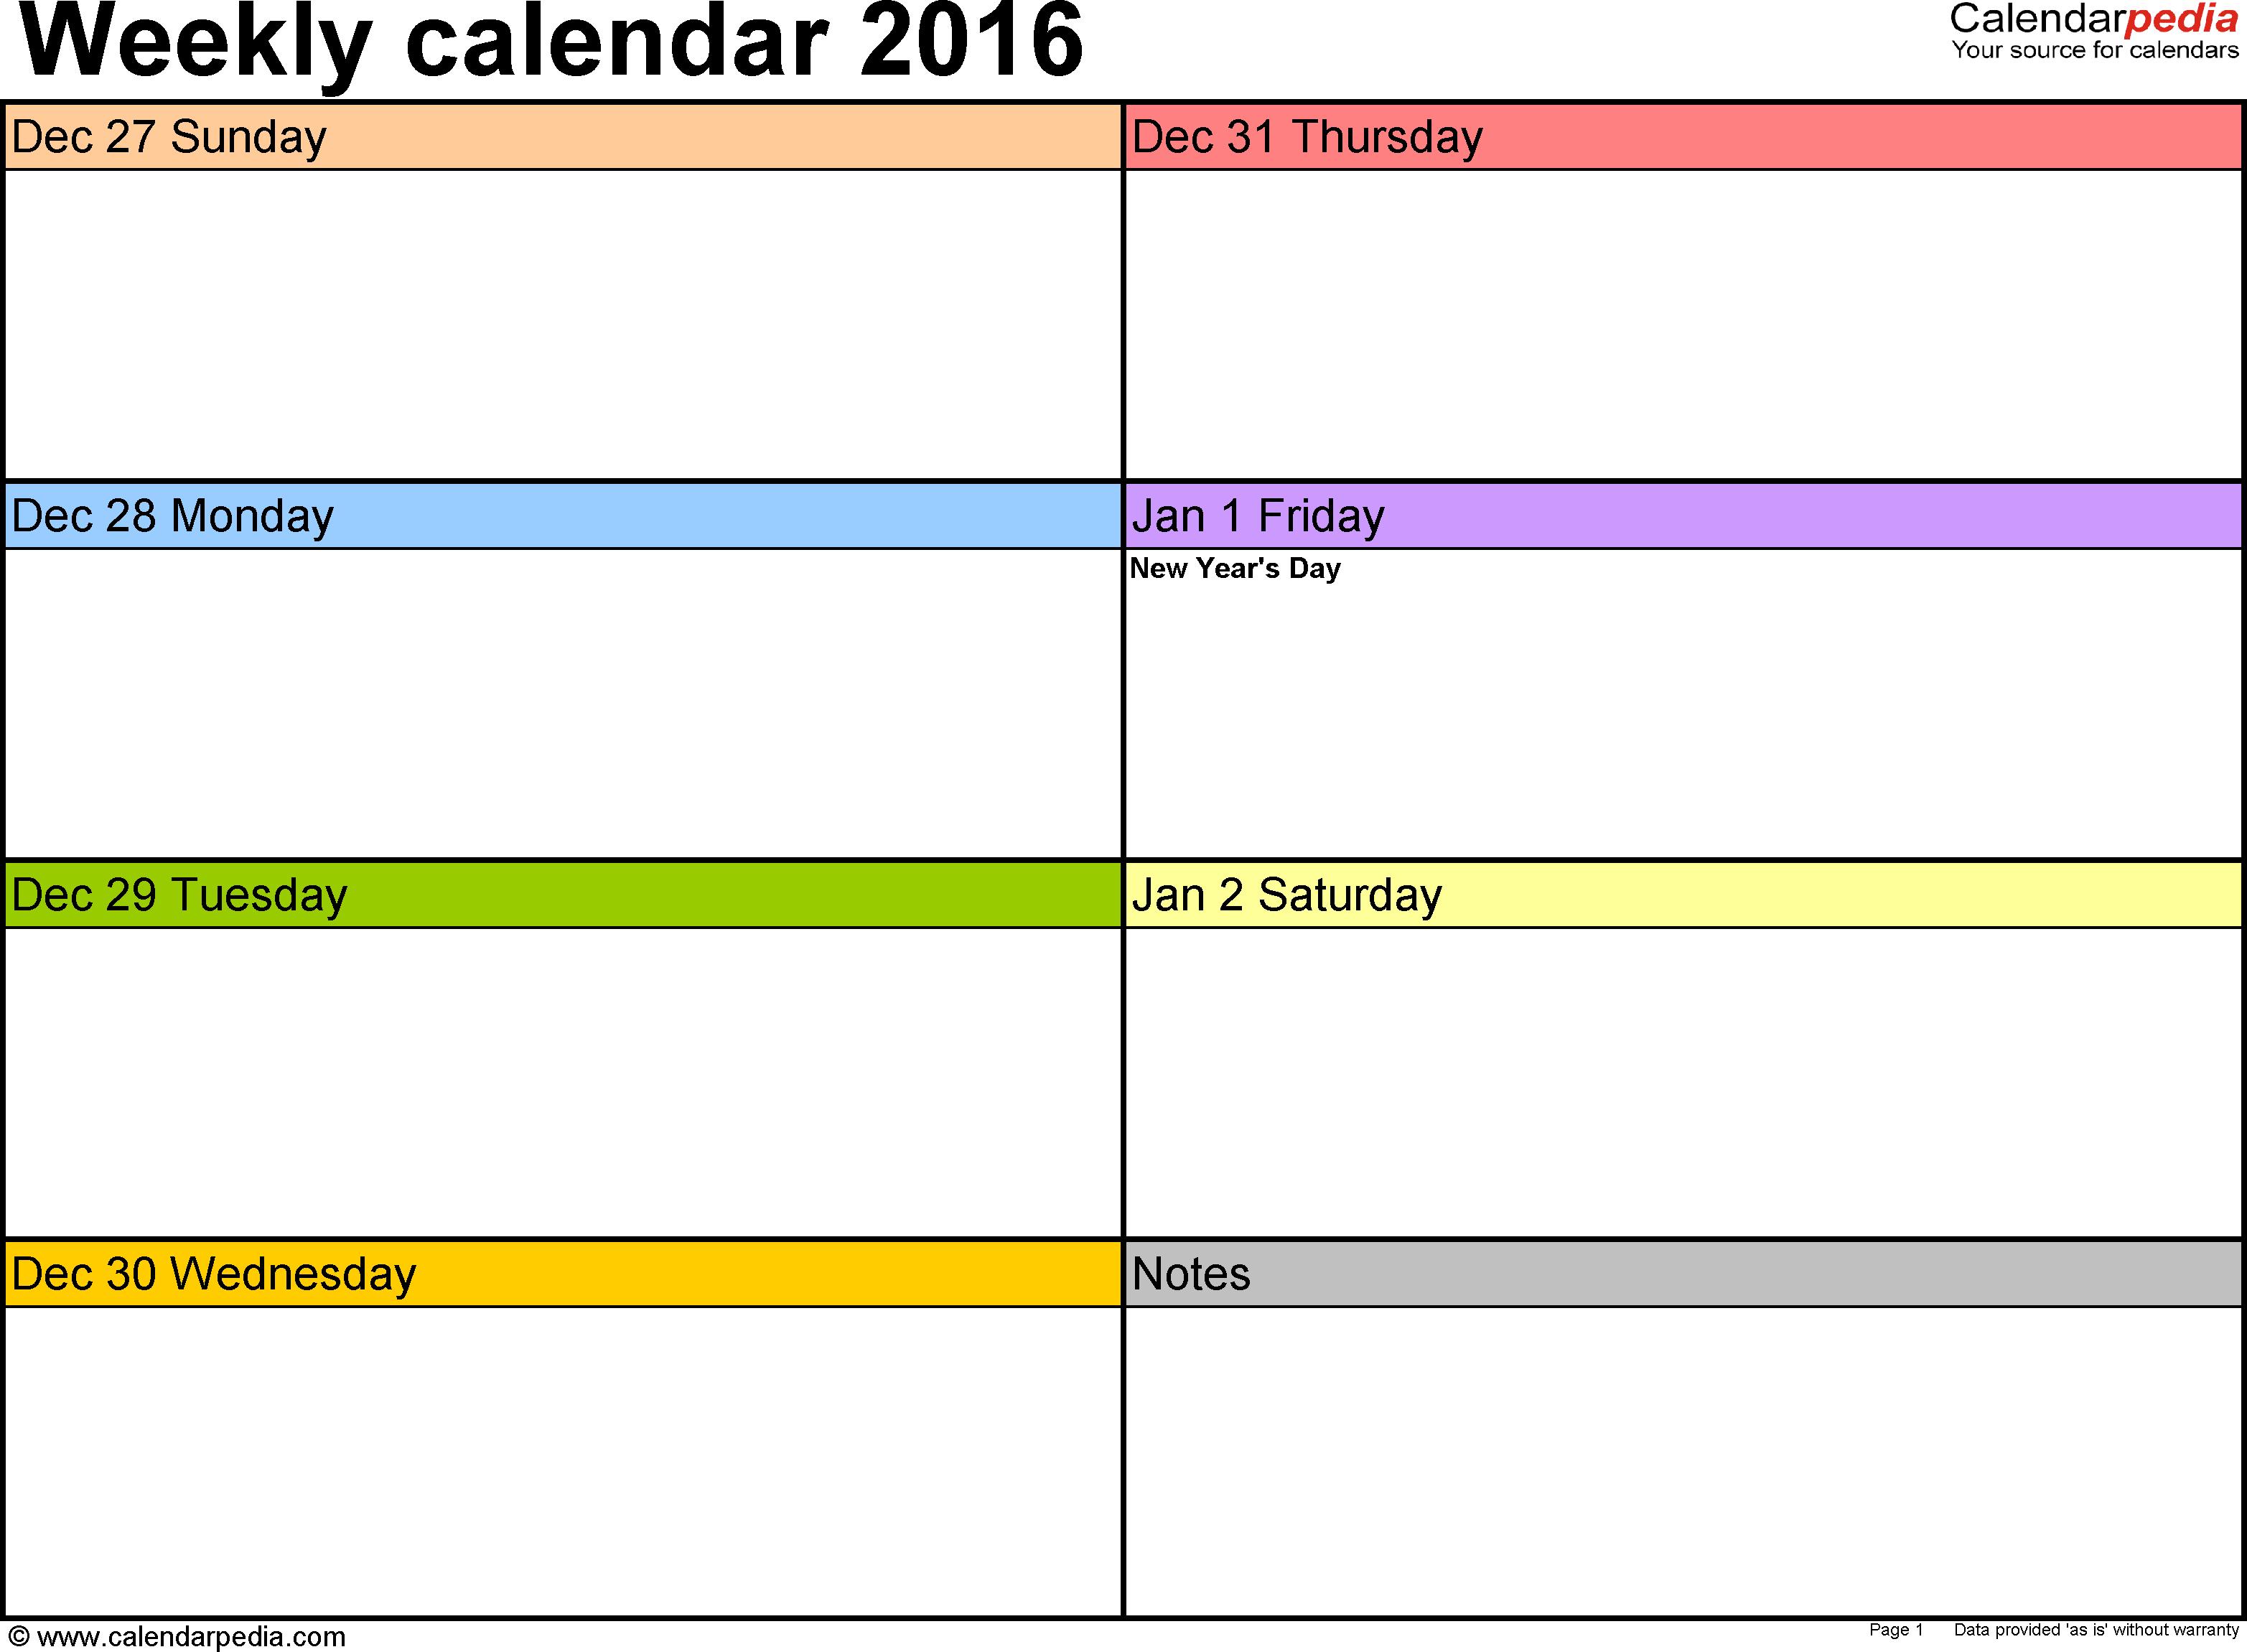 Weekly Calendar 2016: Template For Pdf Version 6, Landscape 1 Week Printable Calendar